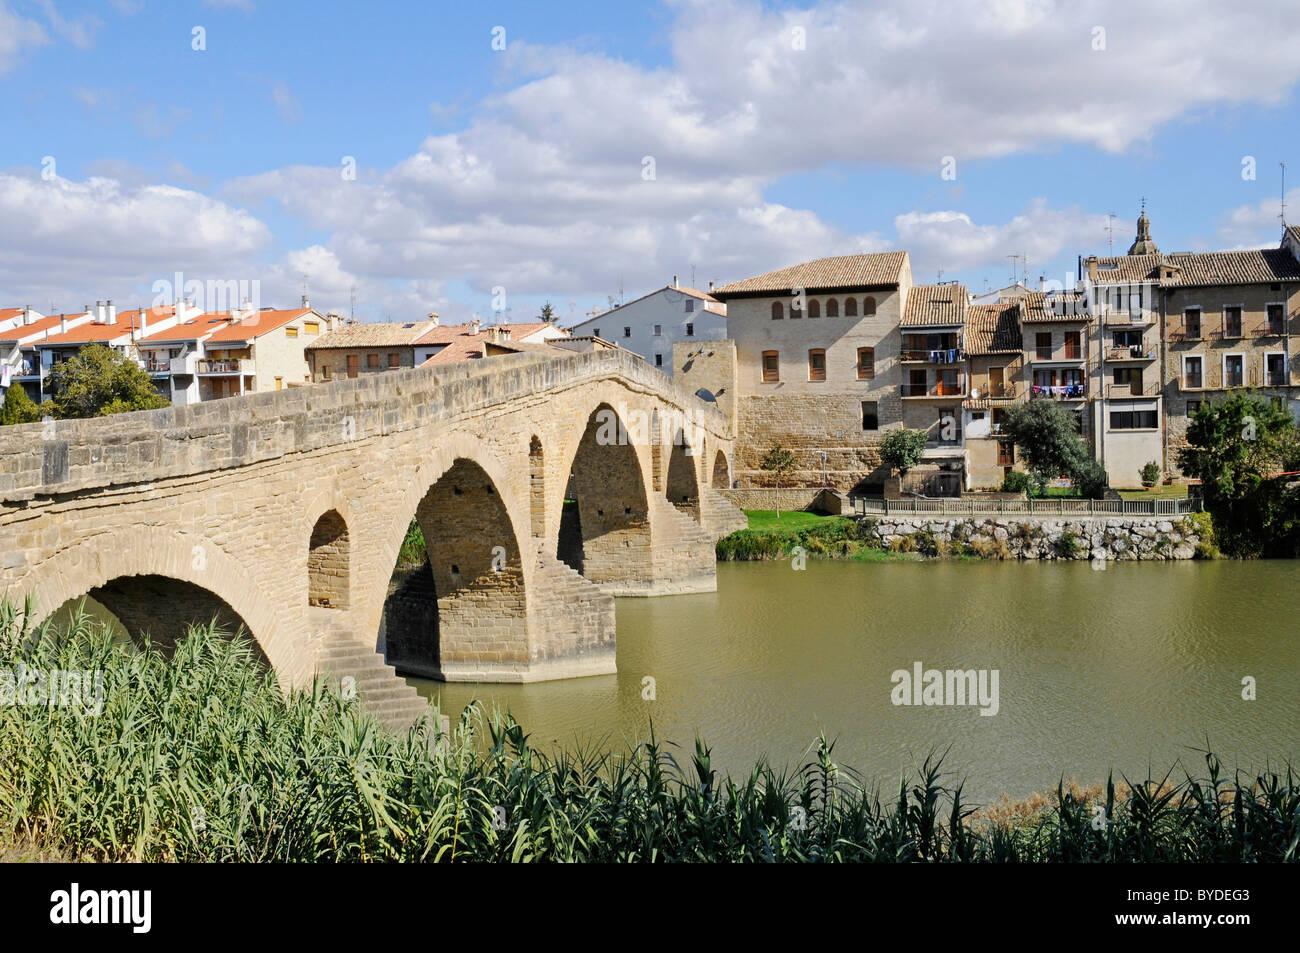 Romanica puente bridge over the Arga river, Camino de Santiago or the Way of St James, Puente la Reina, Pamplona, - Stock Image